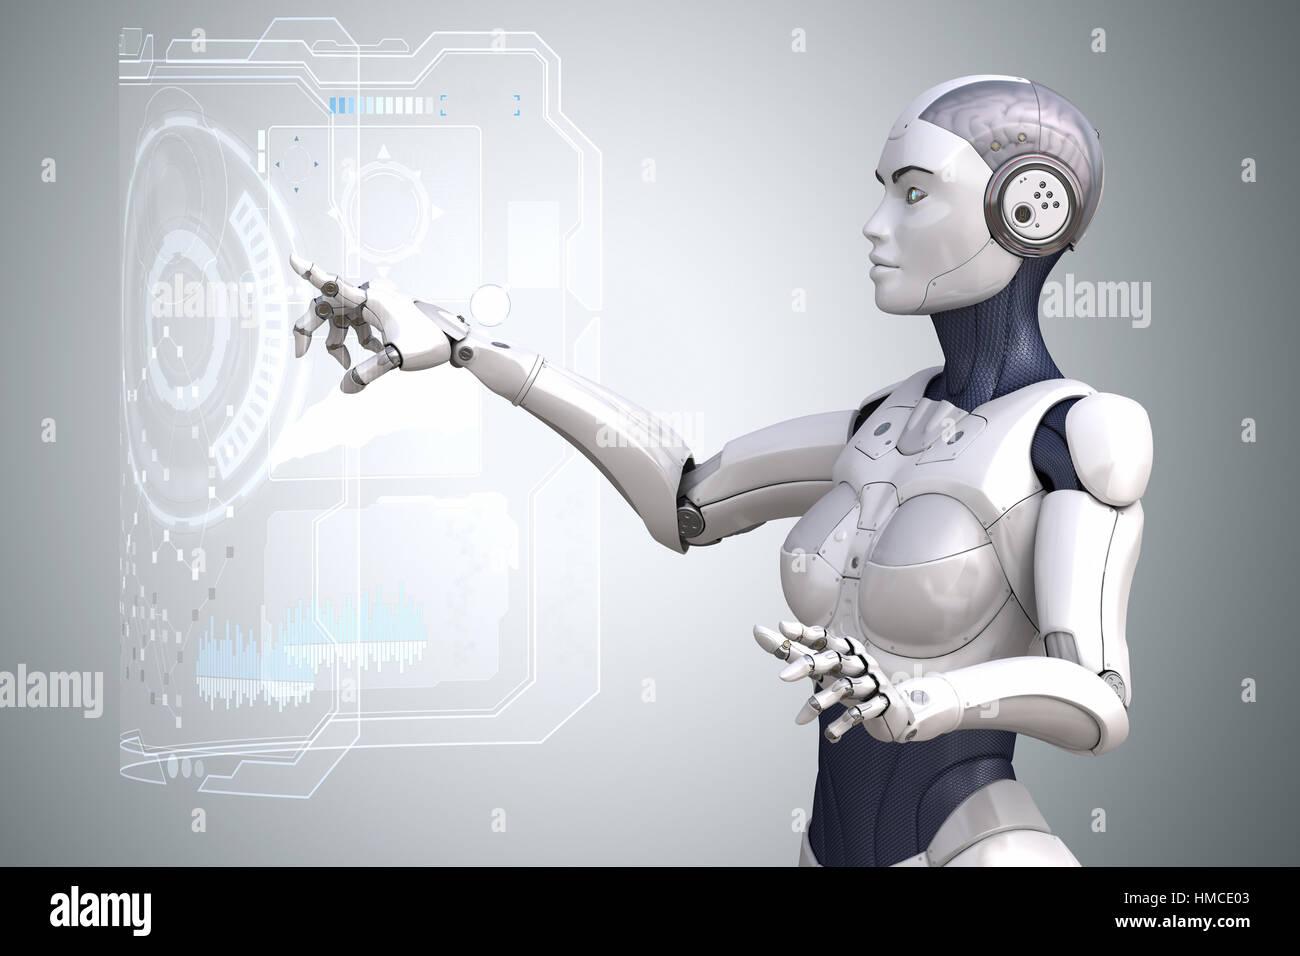 Robot está trabajando con pantalla táctil de Realidad Virtual. Ilustración 3D Imagen De Stock